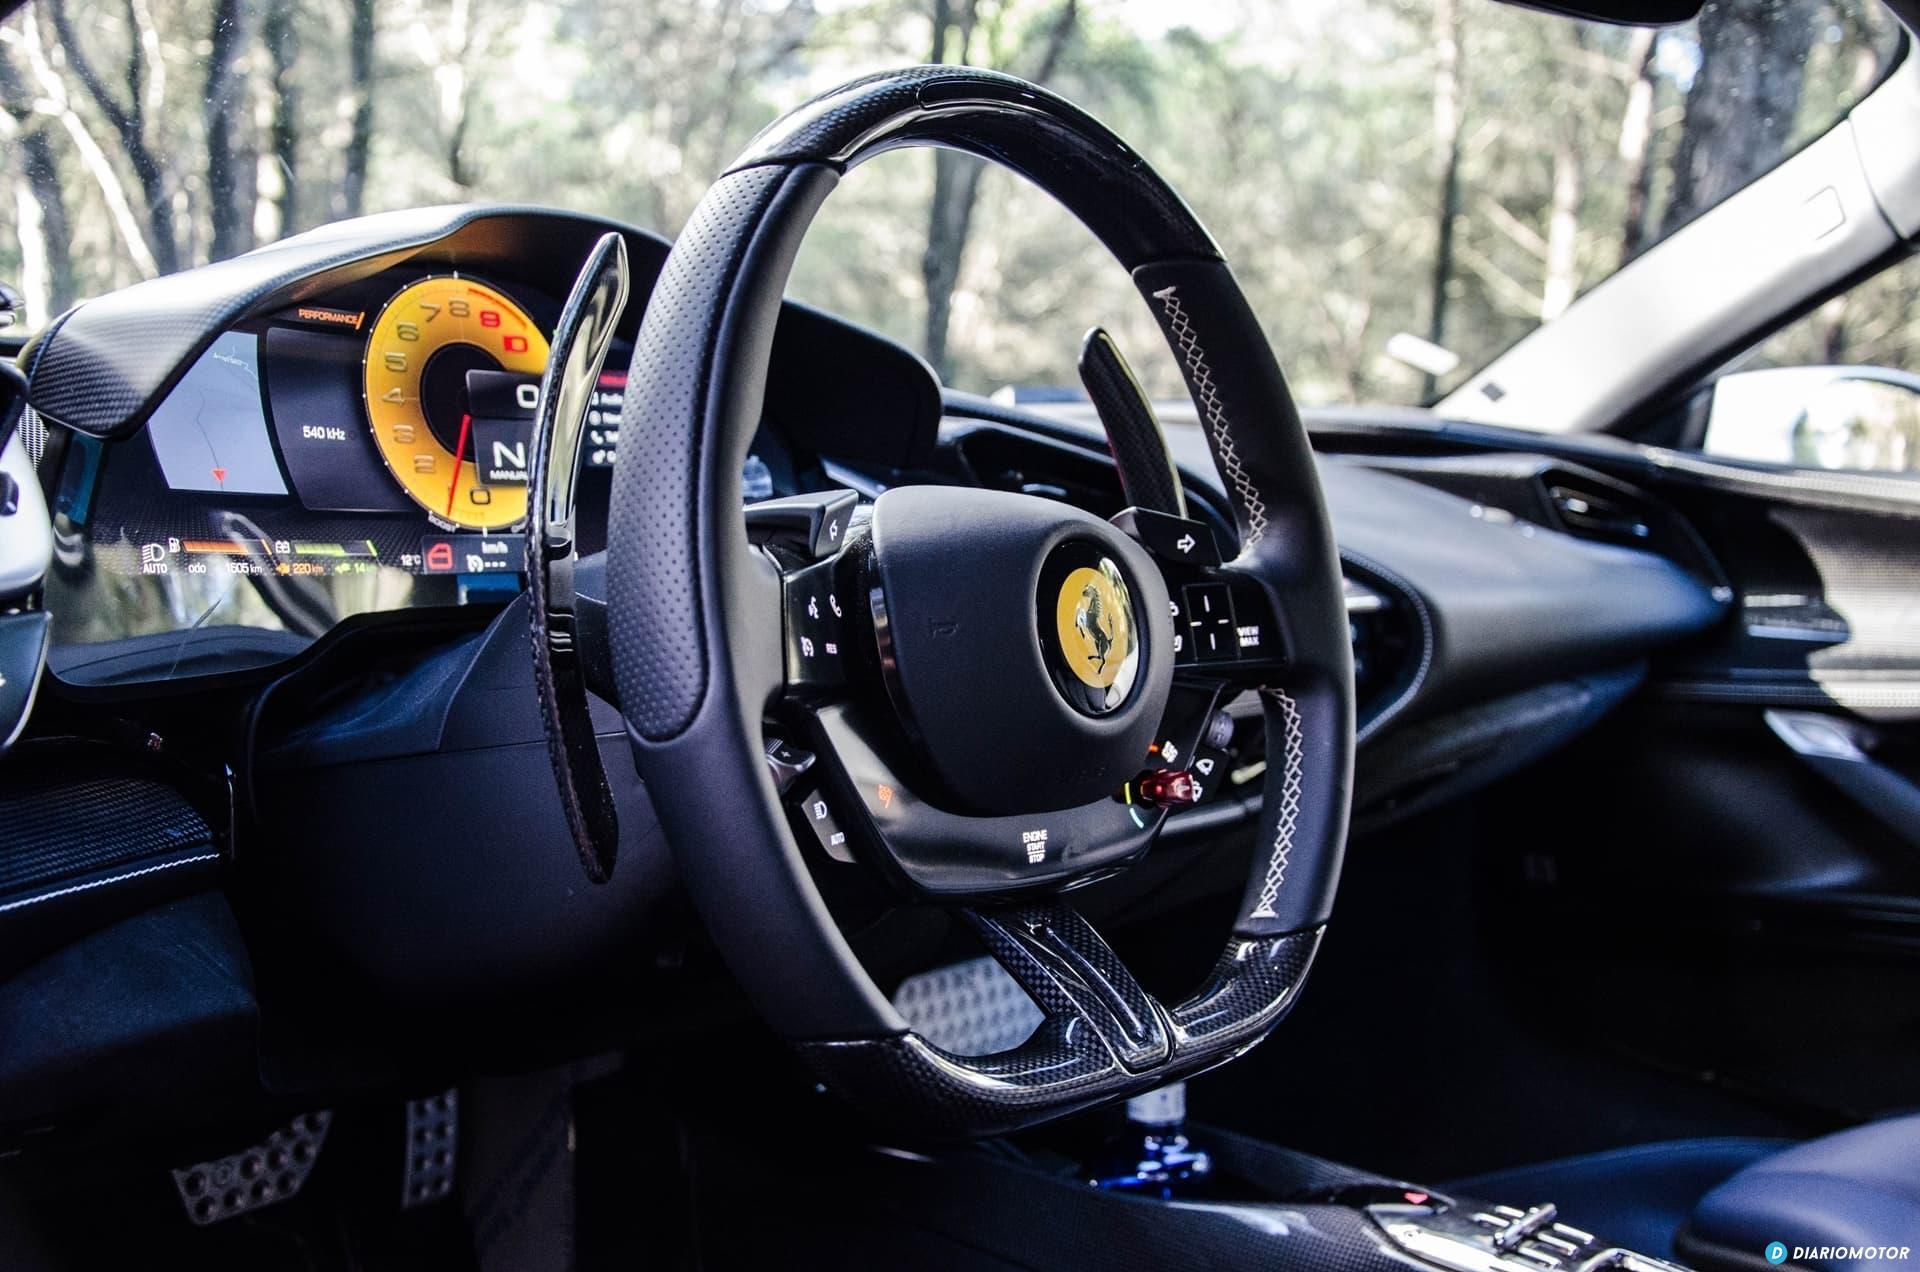 Ferrari Sf90 Stradale Prueba Dcd 1220 054